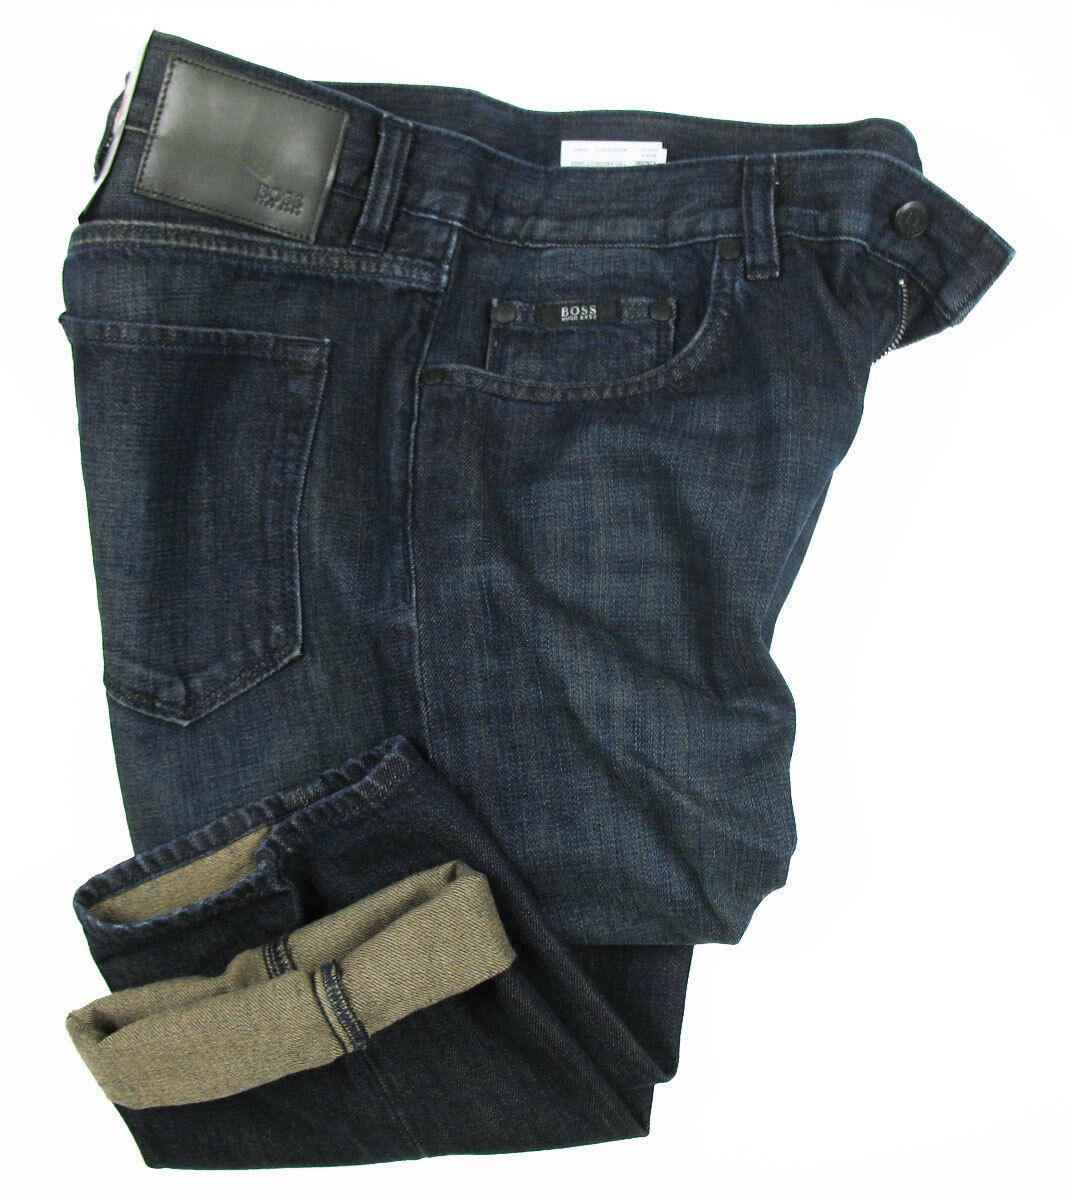 Boss nero Jeans Maine in 33 33 33 34 (regular fit) blu scuro TRATTATO eab489